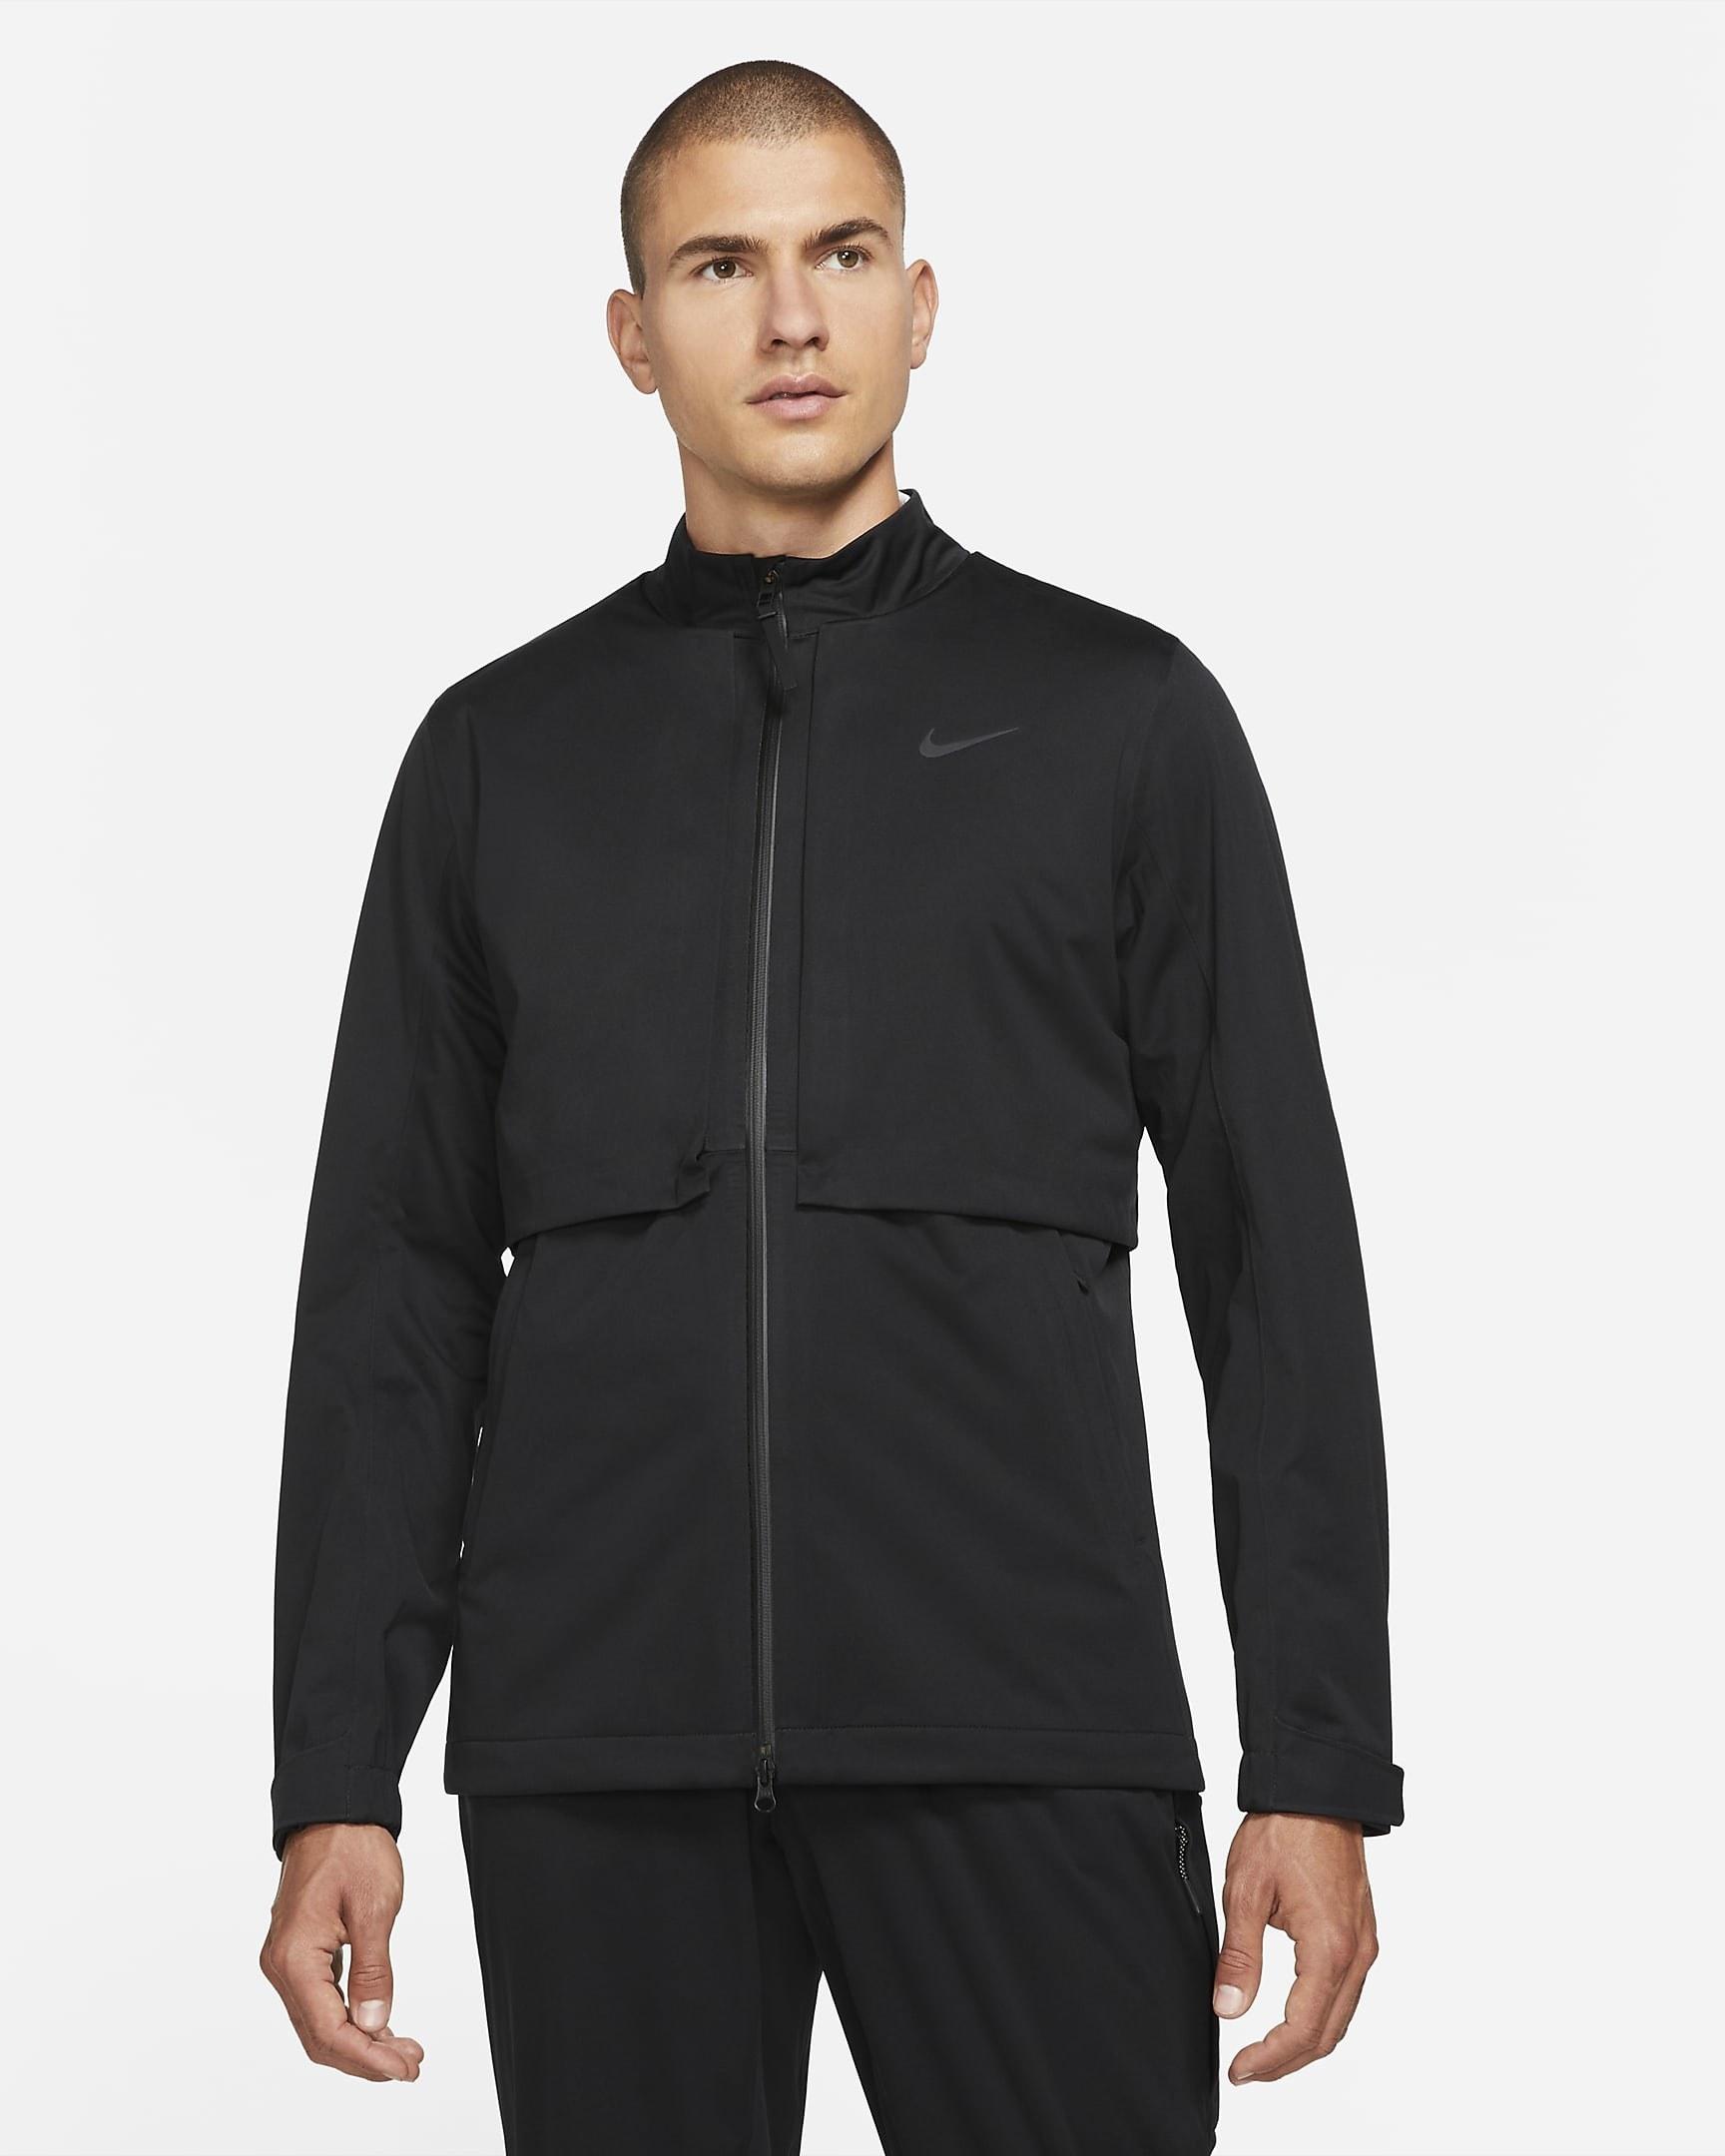 Model wearing black weatherproof jacket zipped up